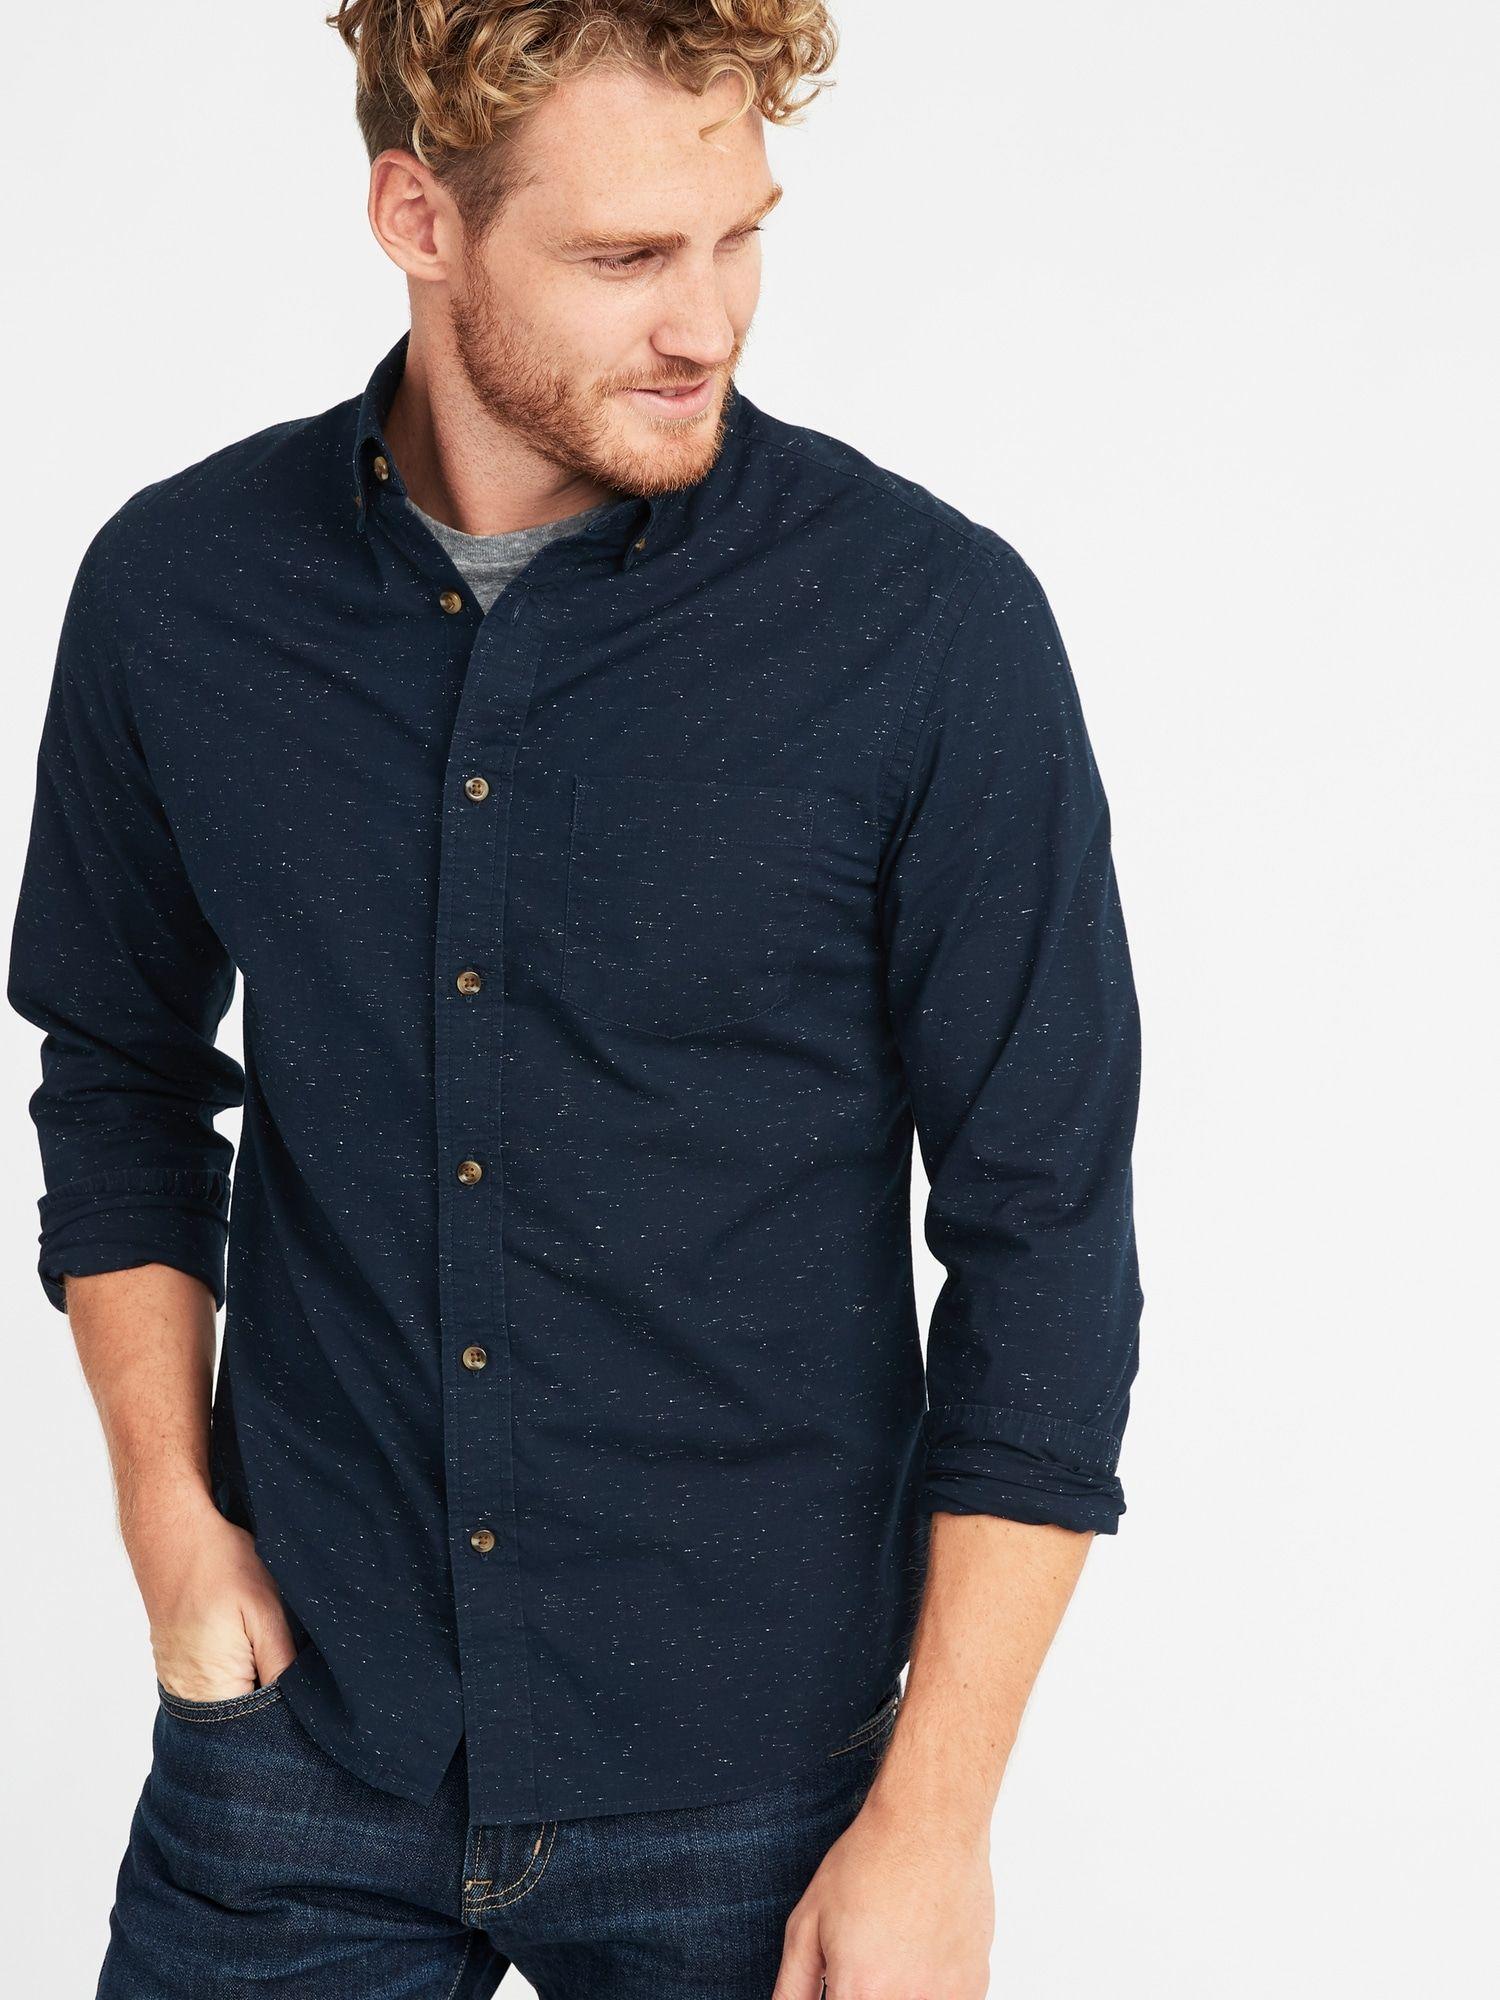 71f695f26c7b8 Slim-Fit Built-In Flex Everyday Neps Shirt for Men